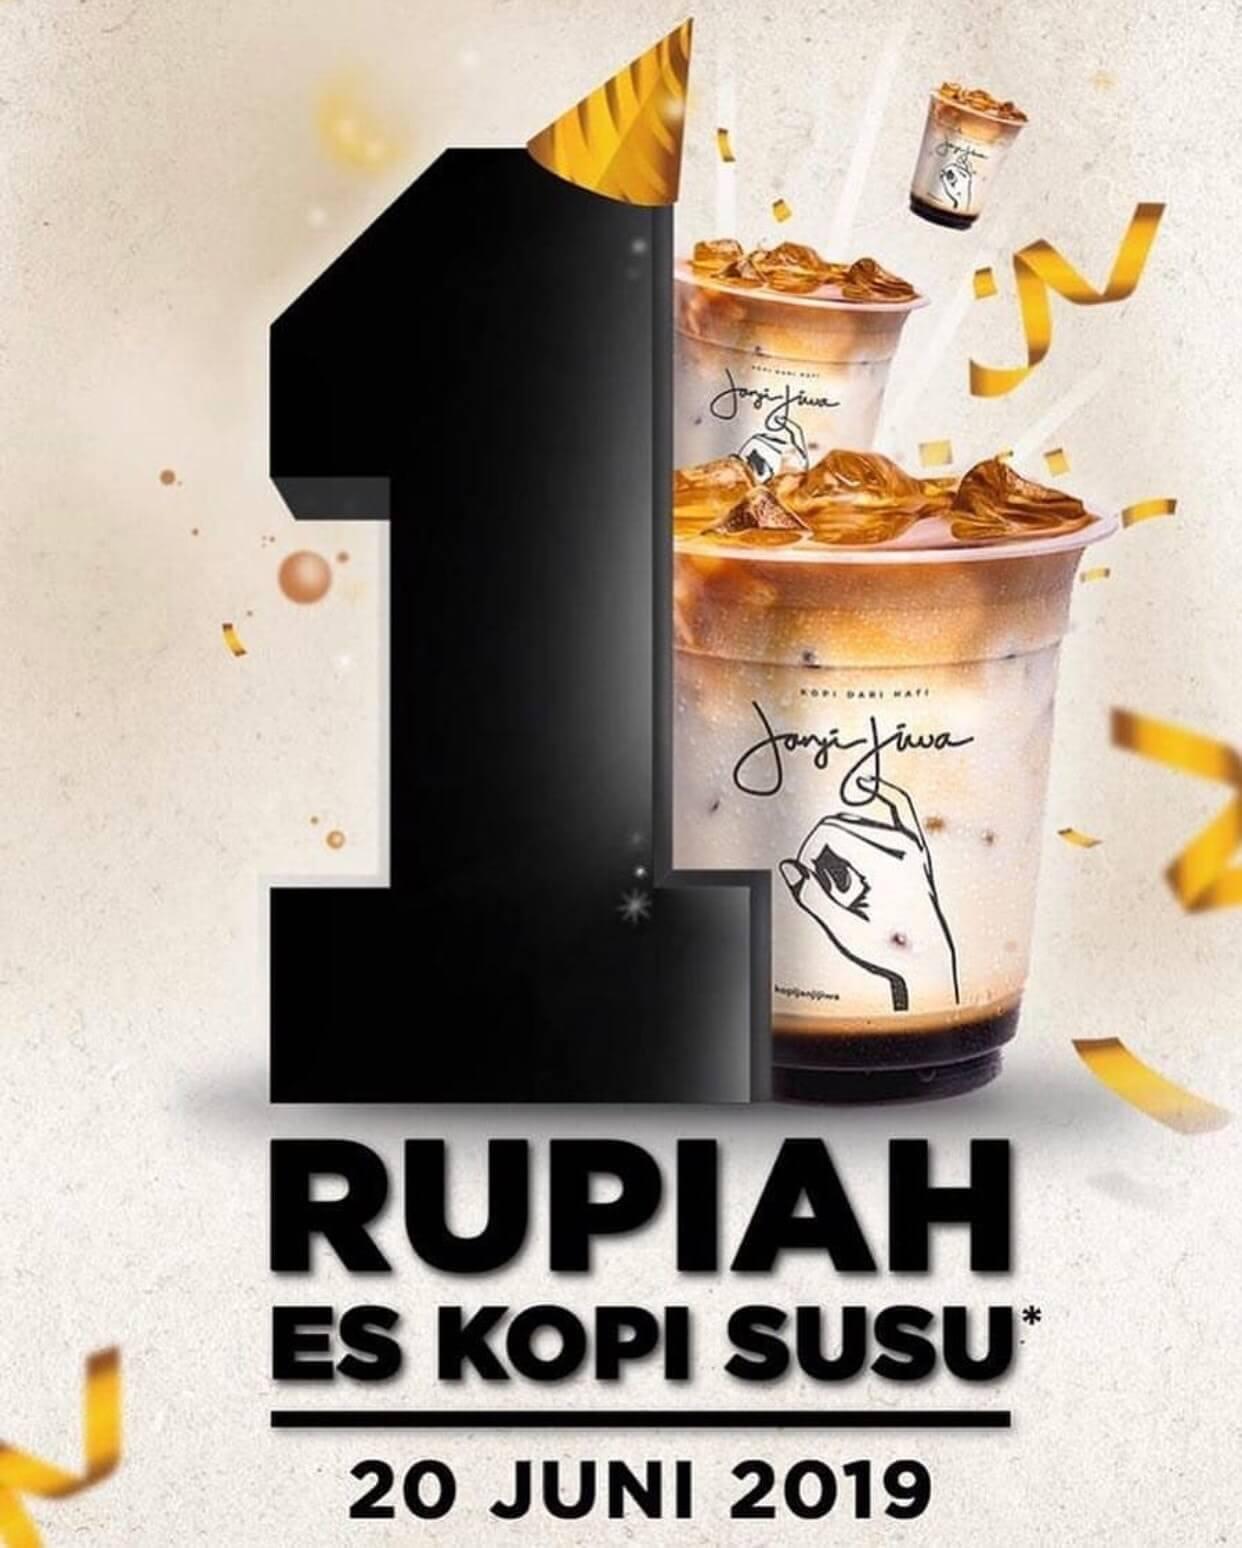 Kopi Janji jiwa 1st ANNIVERSARY PROMO!! Es Kopi Susu Hanya Rp. 1,-*